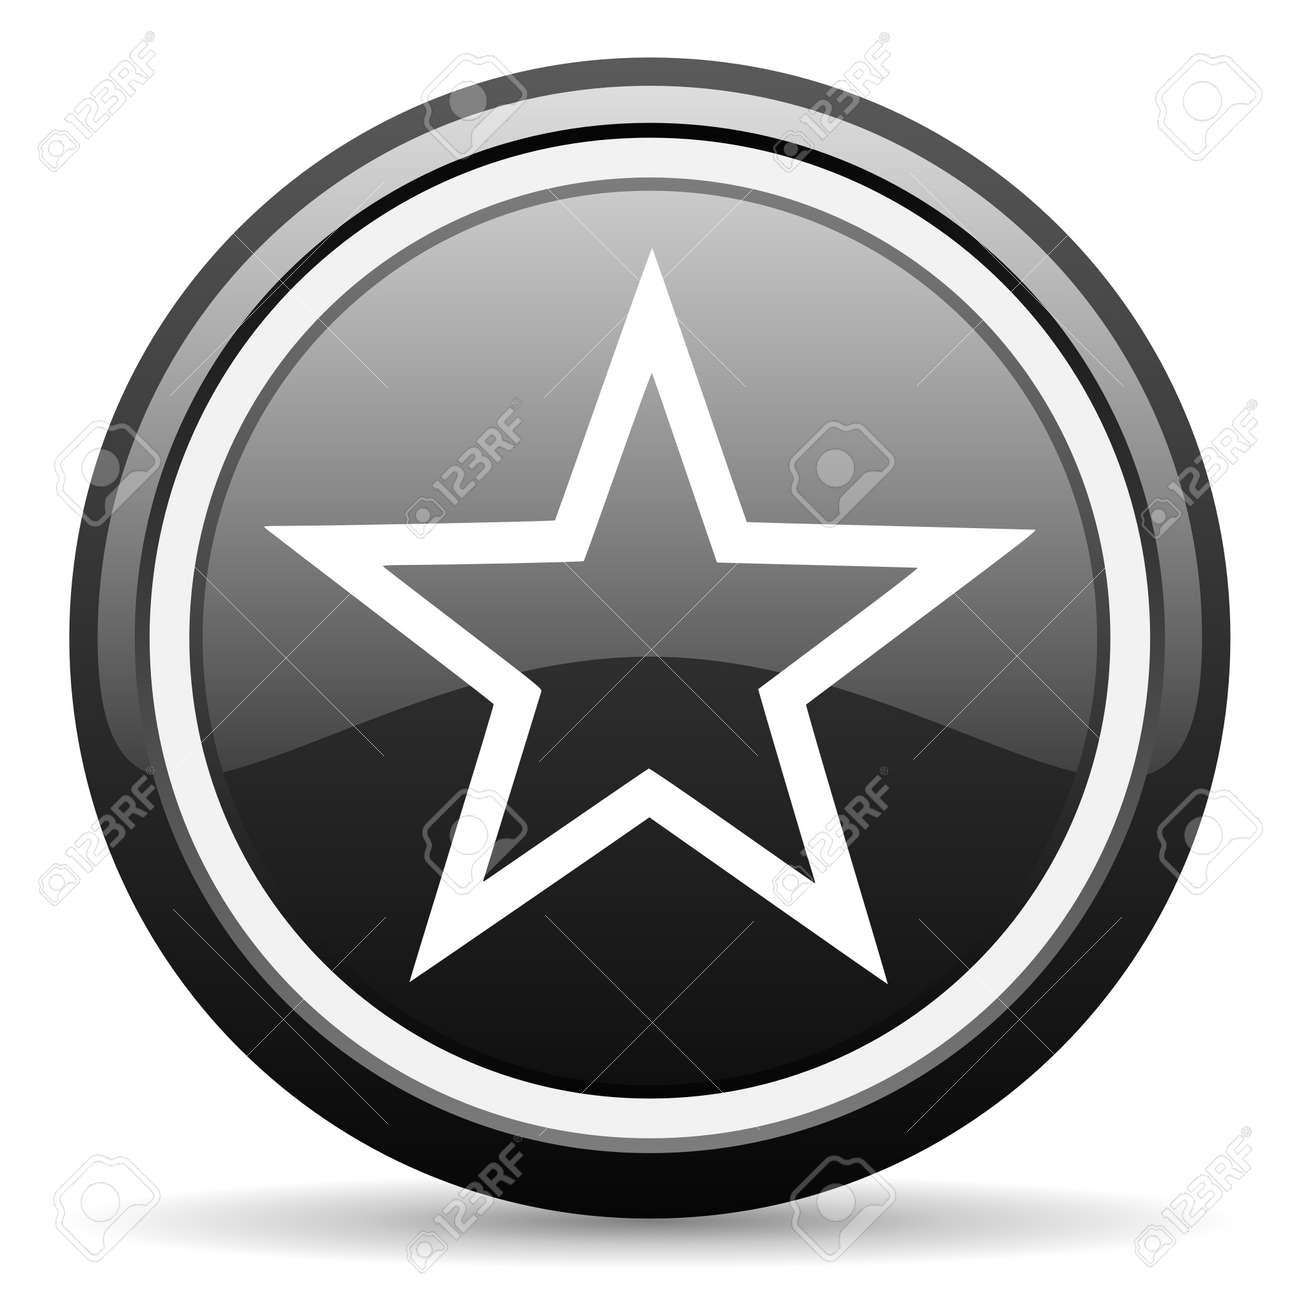 star black glossy icon on white background Stock Photo - 17083857